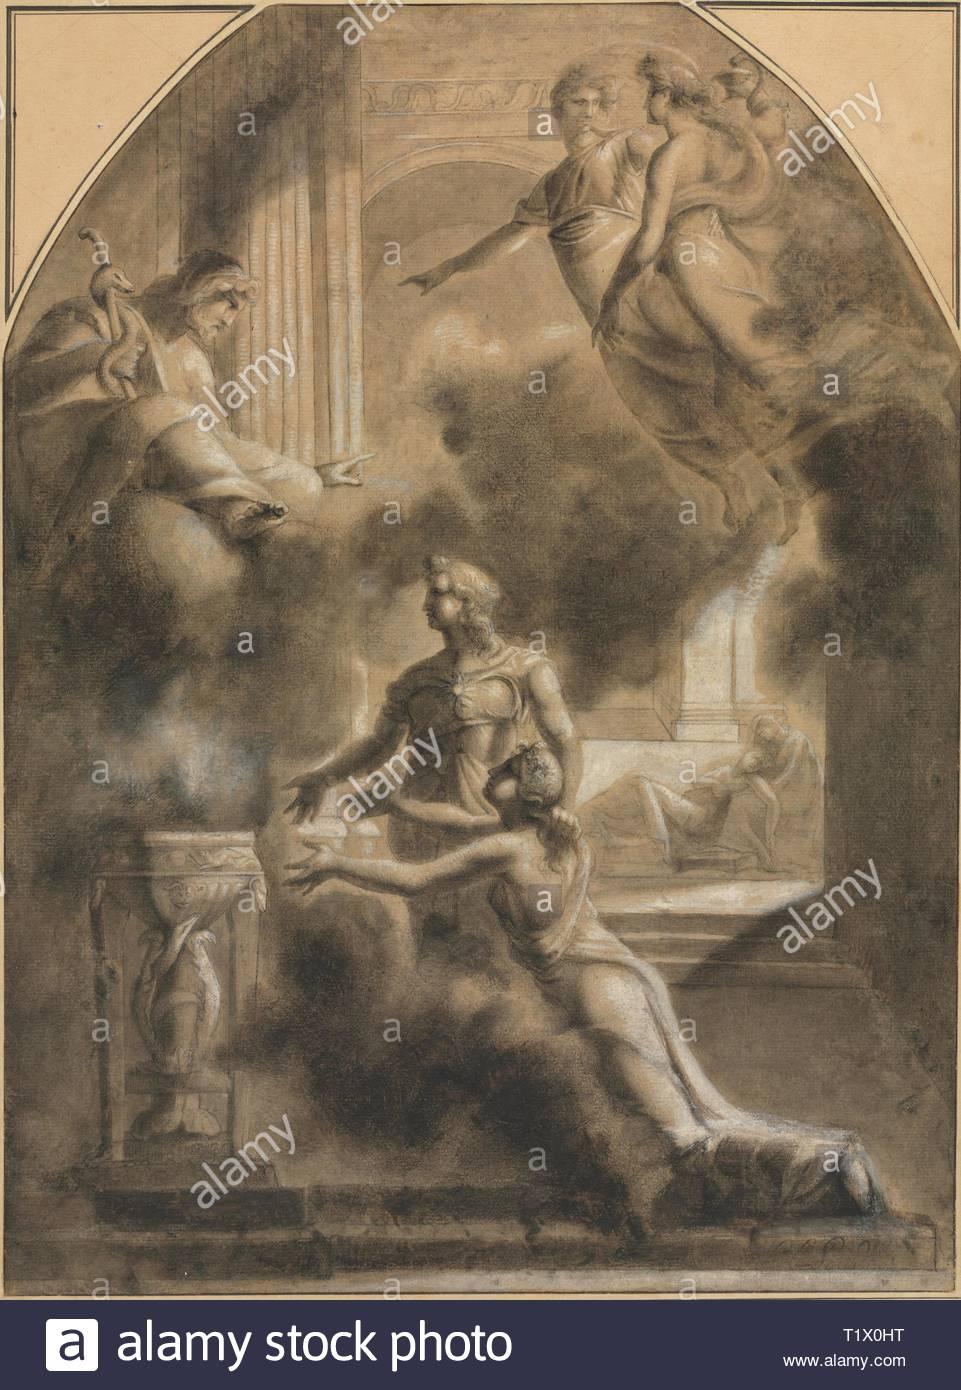 Mythological scene pierre paul prudhon french 1758 1823 black chalk